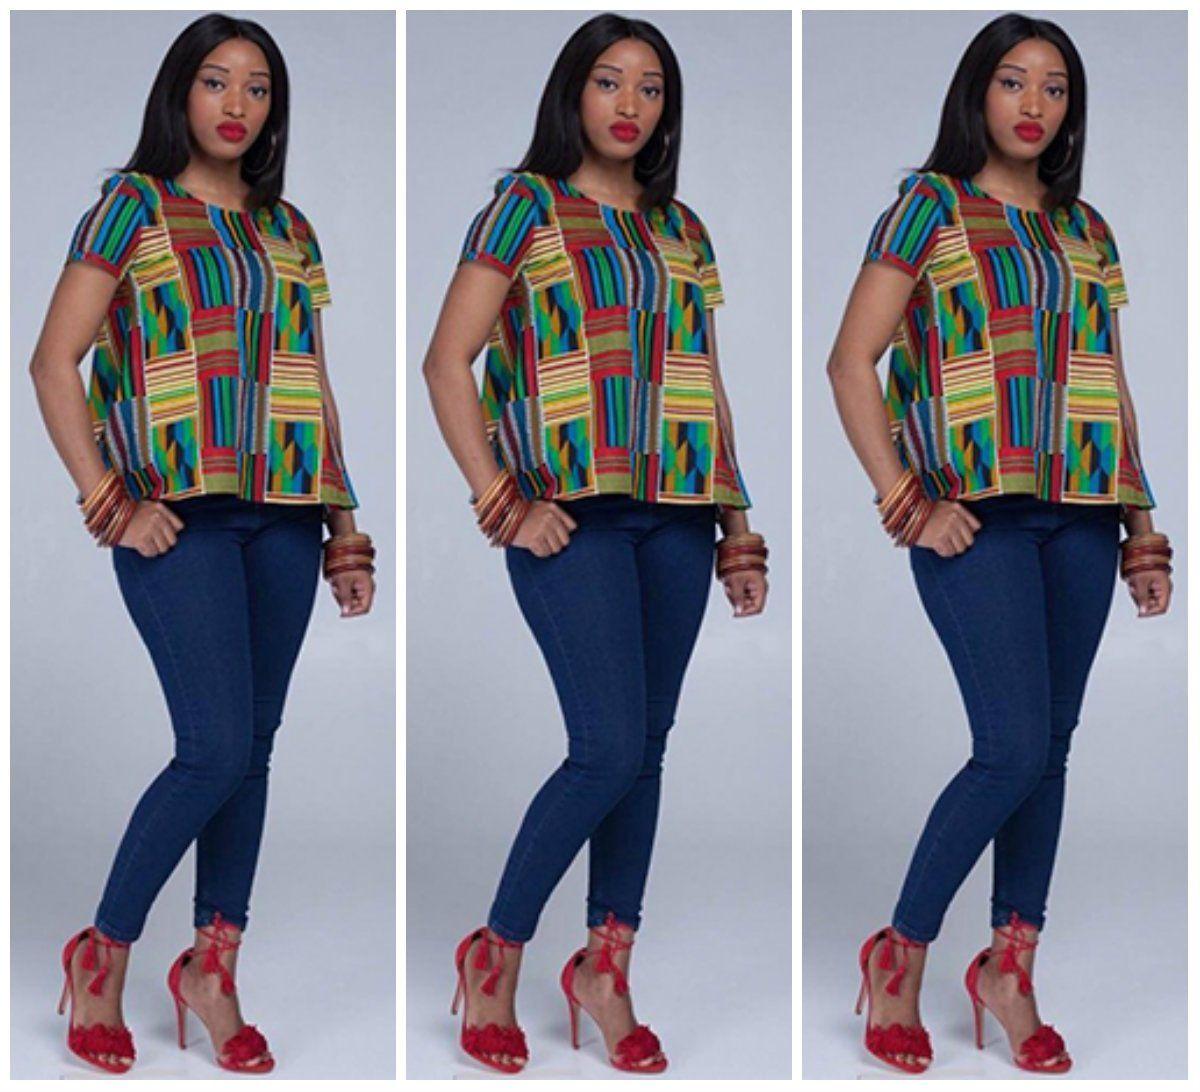 30 Stylish And Trendy Ankara Tops To Wear With Jeans - AfroCosmopolitan |  African print tops, Ankara tops, Ankara tops blouses